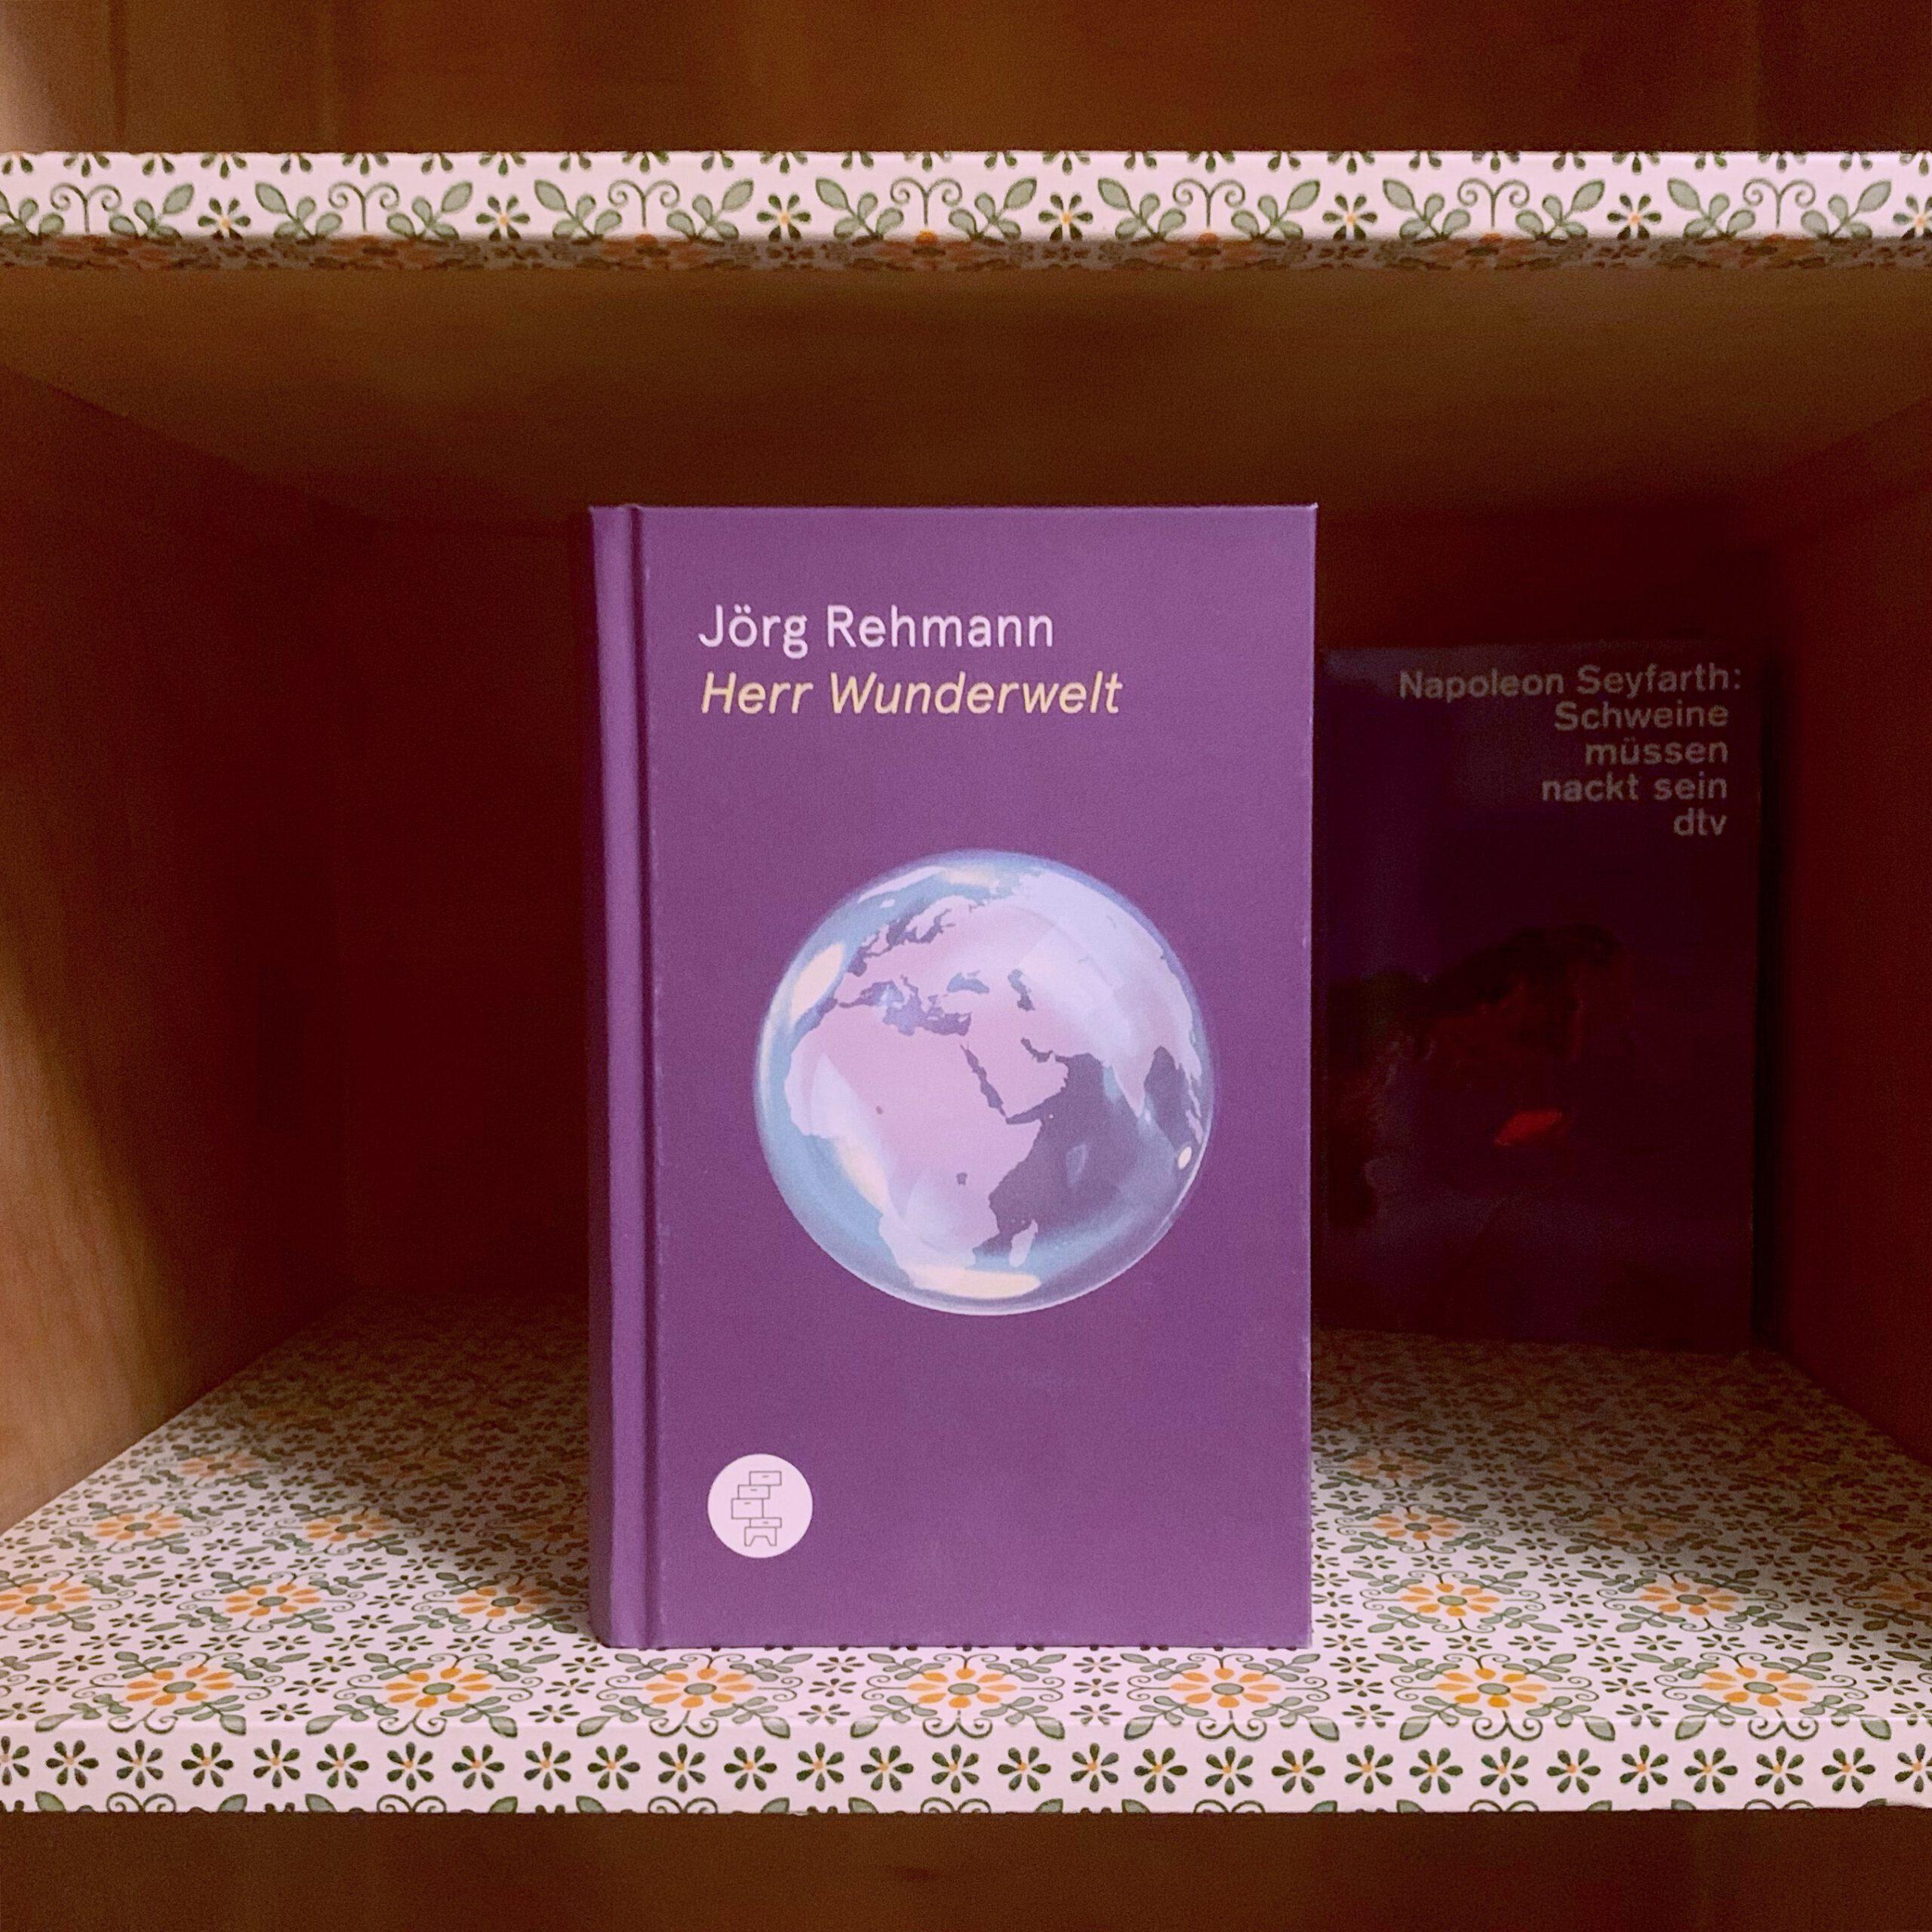 Jörg Rehmann - Herr Wunderwelt